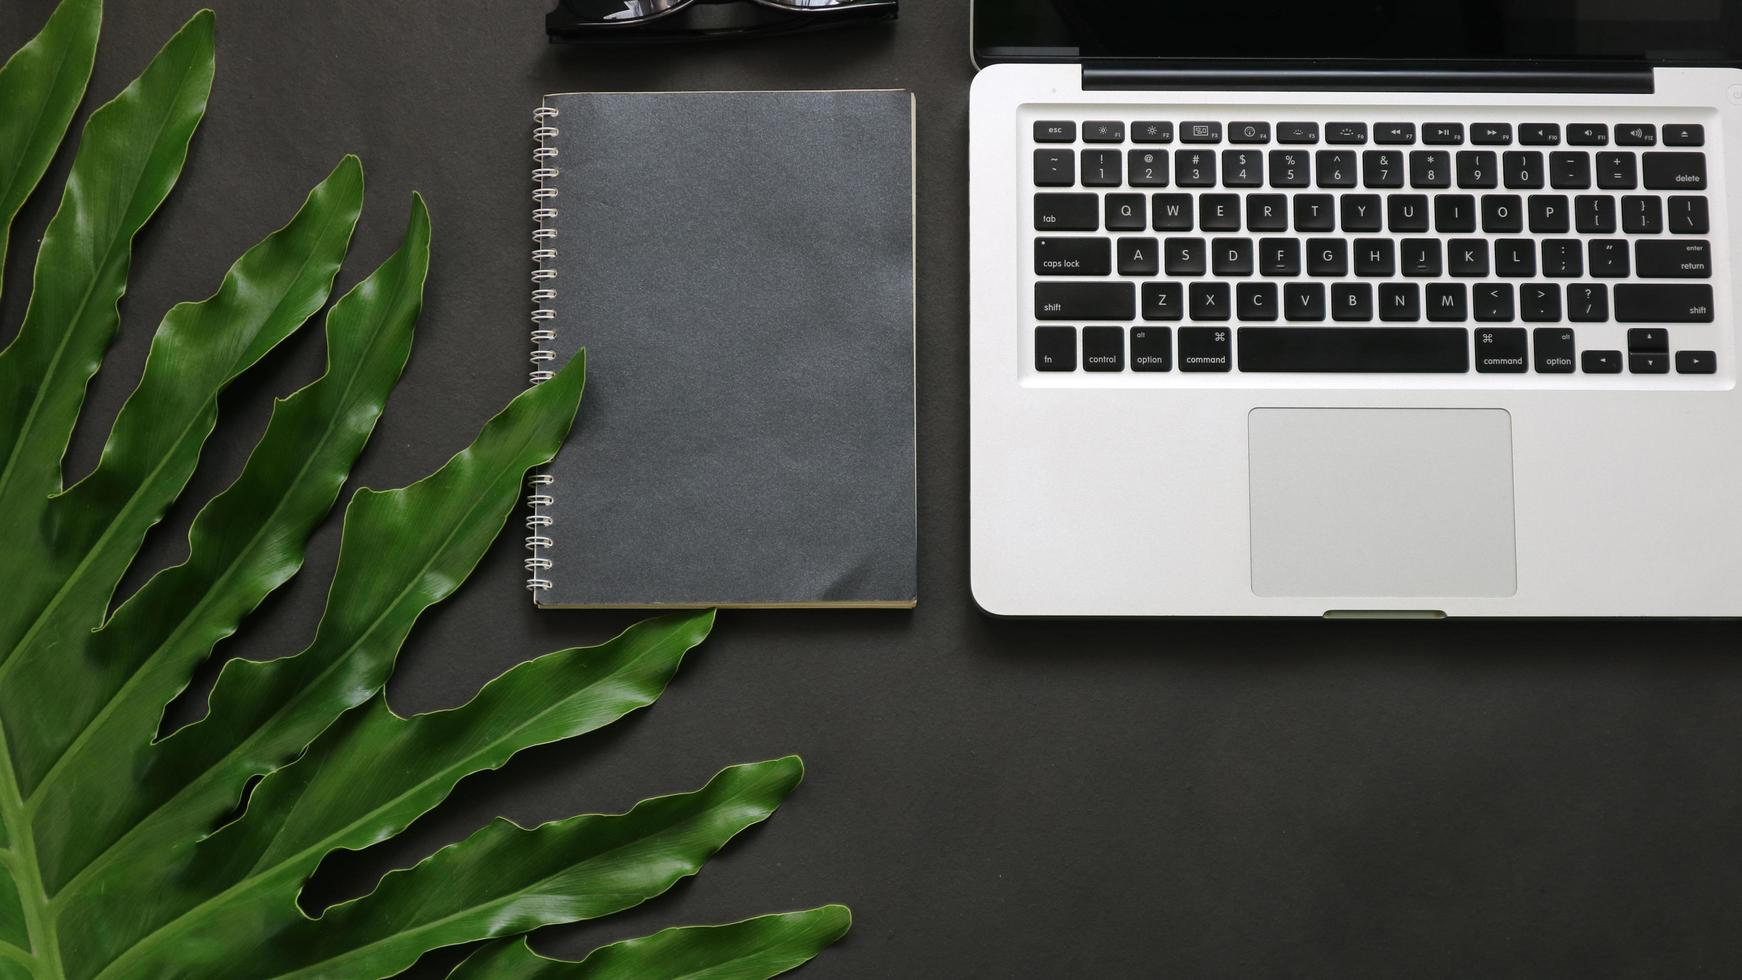 groene bladeren laptop alarm notebook op zwarte achtergrond foto